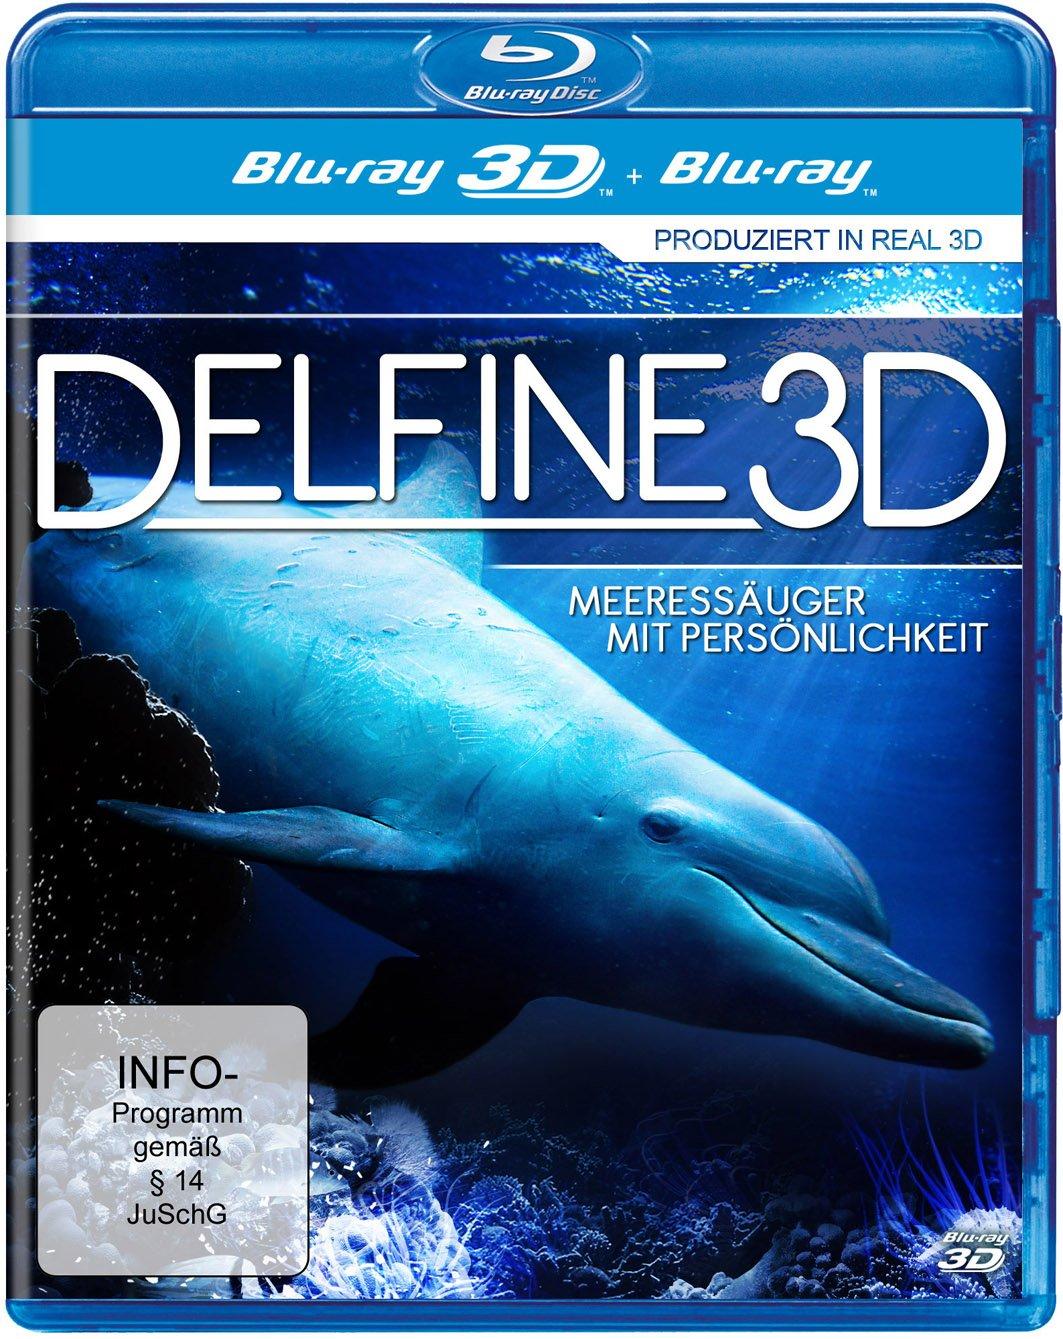 Дельфины 3Д / Dolphins 3D (2013) [Blu-ray 2D/3D, 1080p, BD3D]